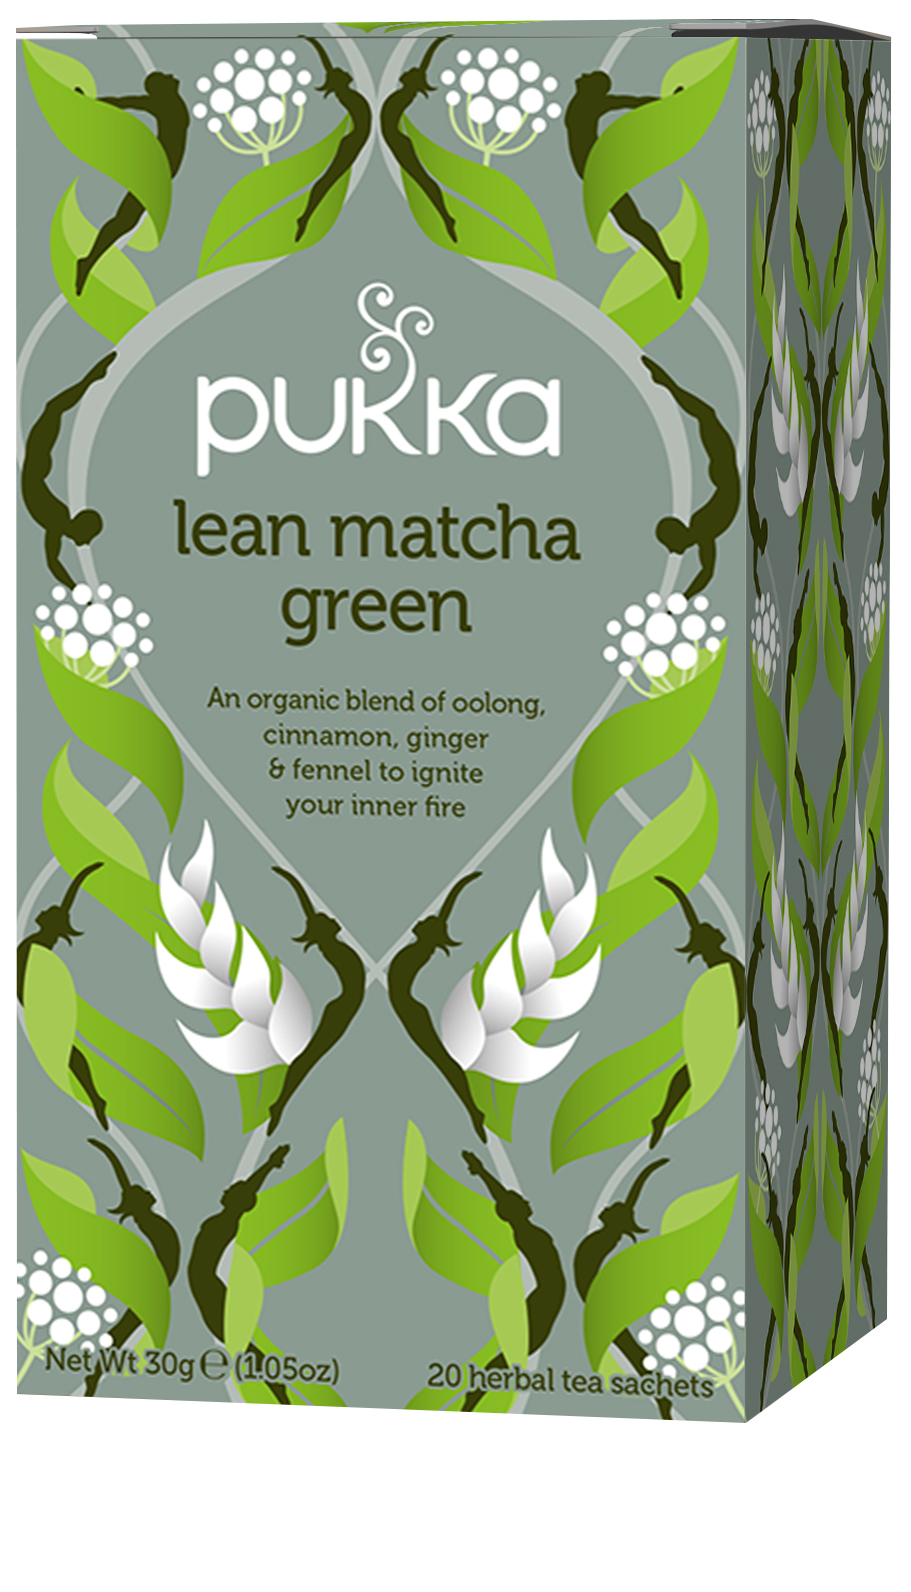 Pukka Lean Matcha Green Organic Tea Bags | 20 pack